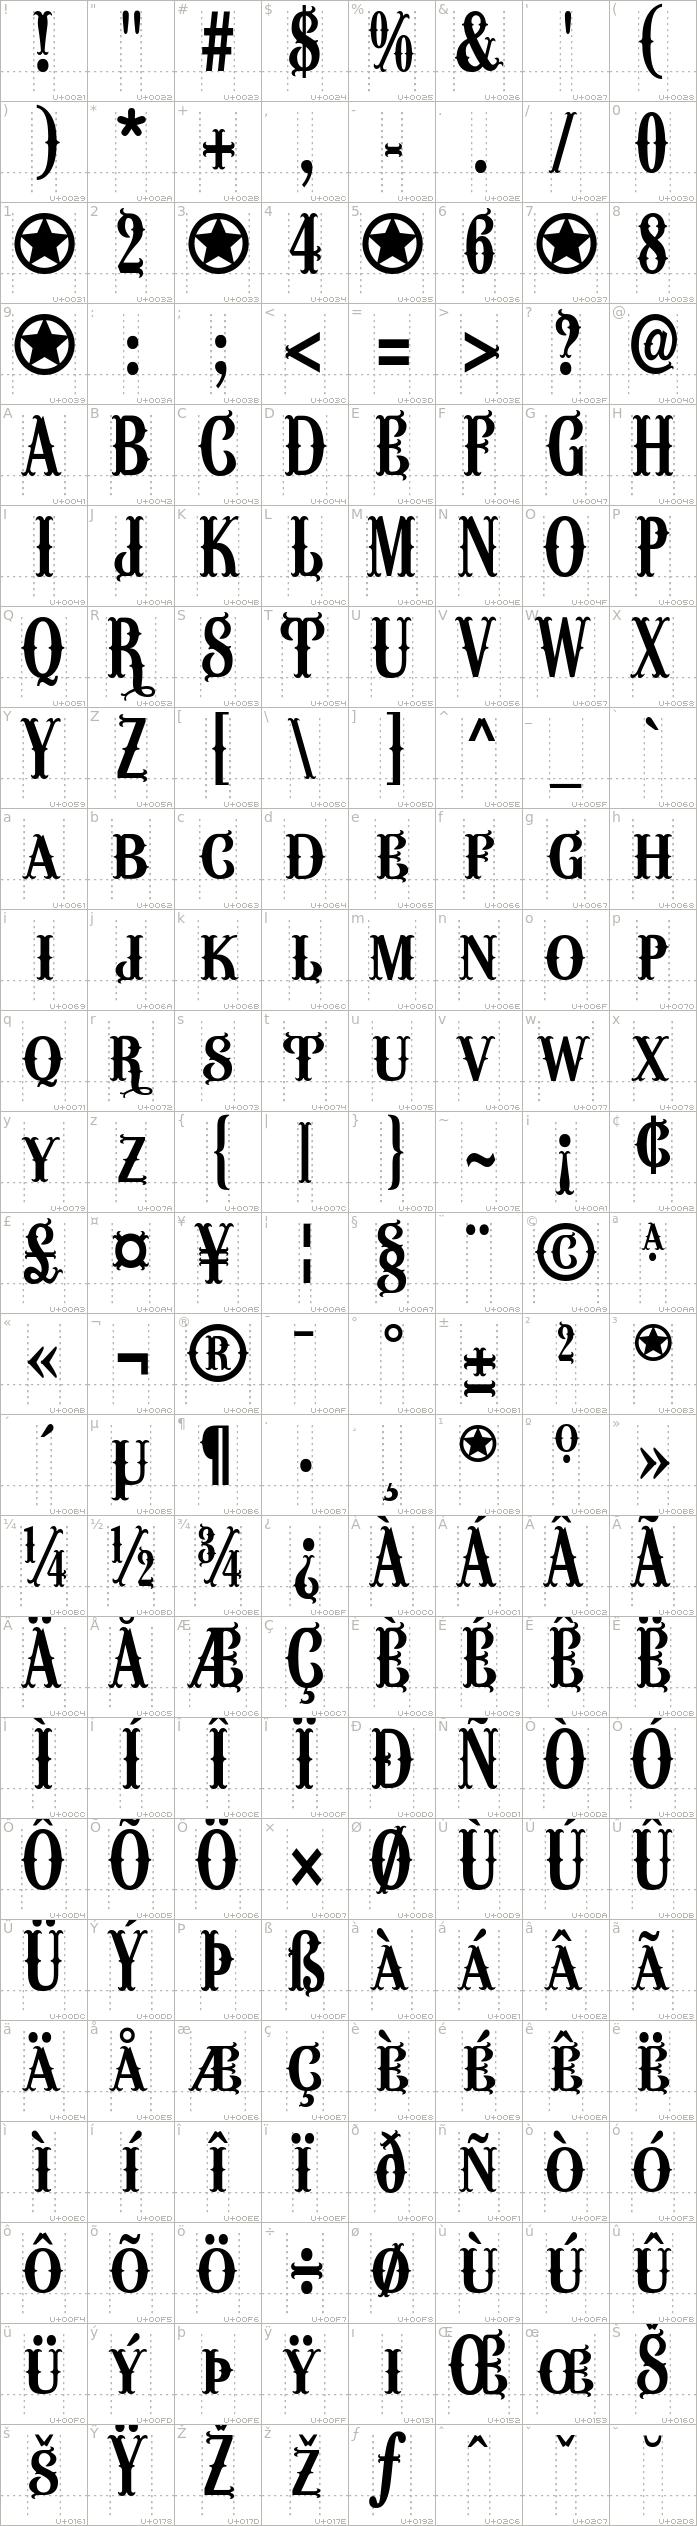 wacamoler-caps.regular.character-map-1